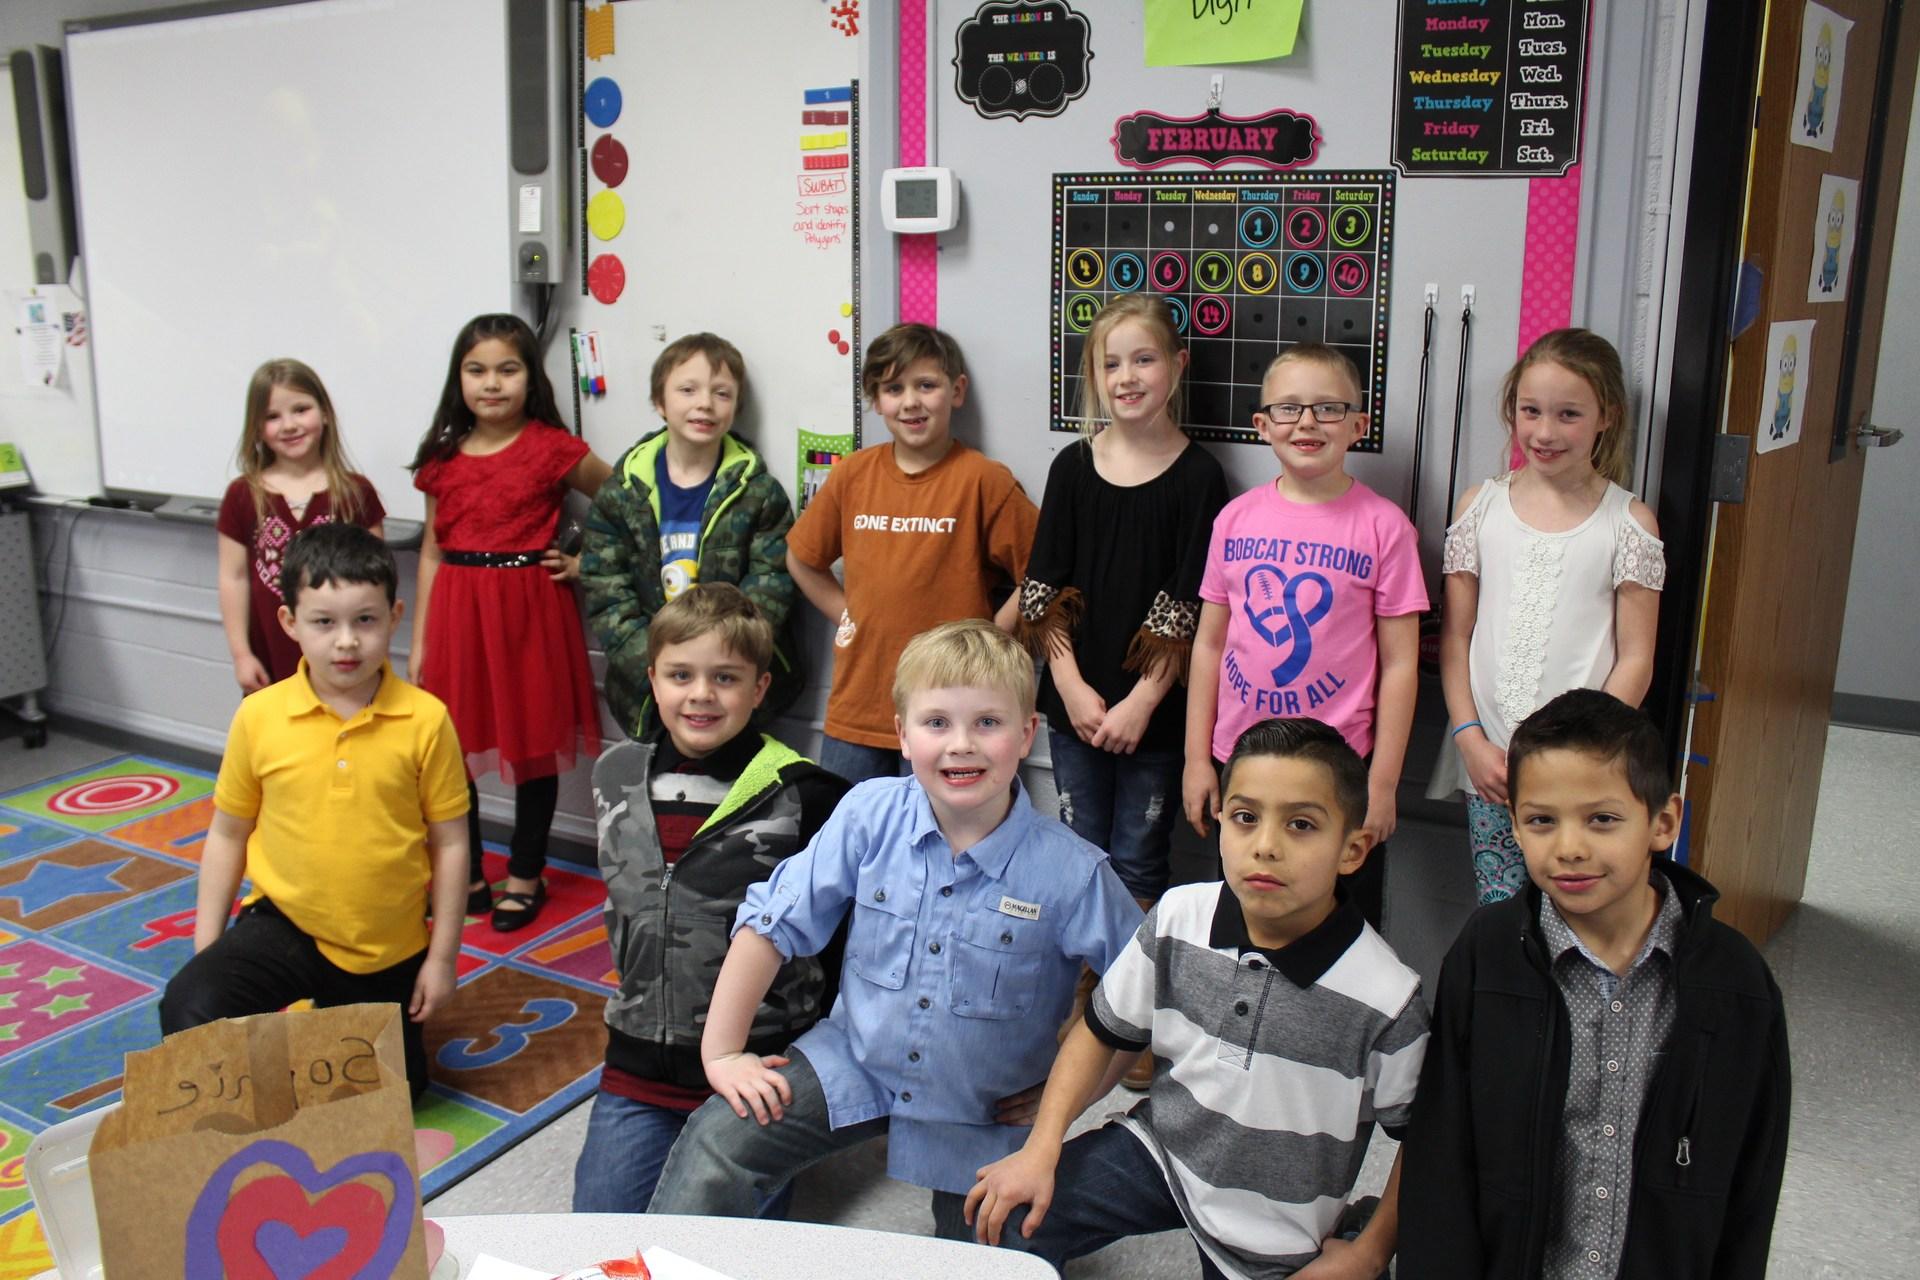 2nd grade class party